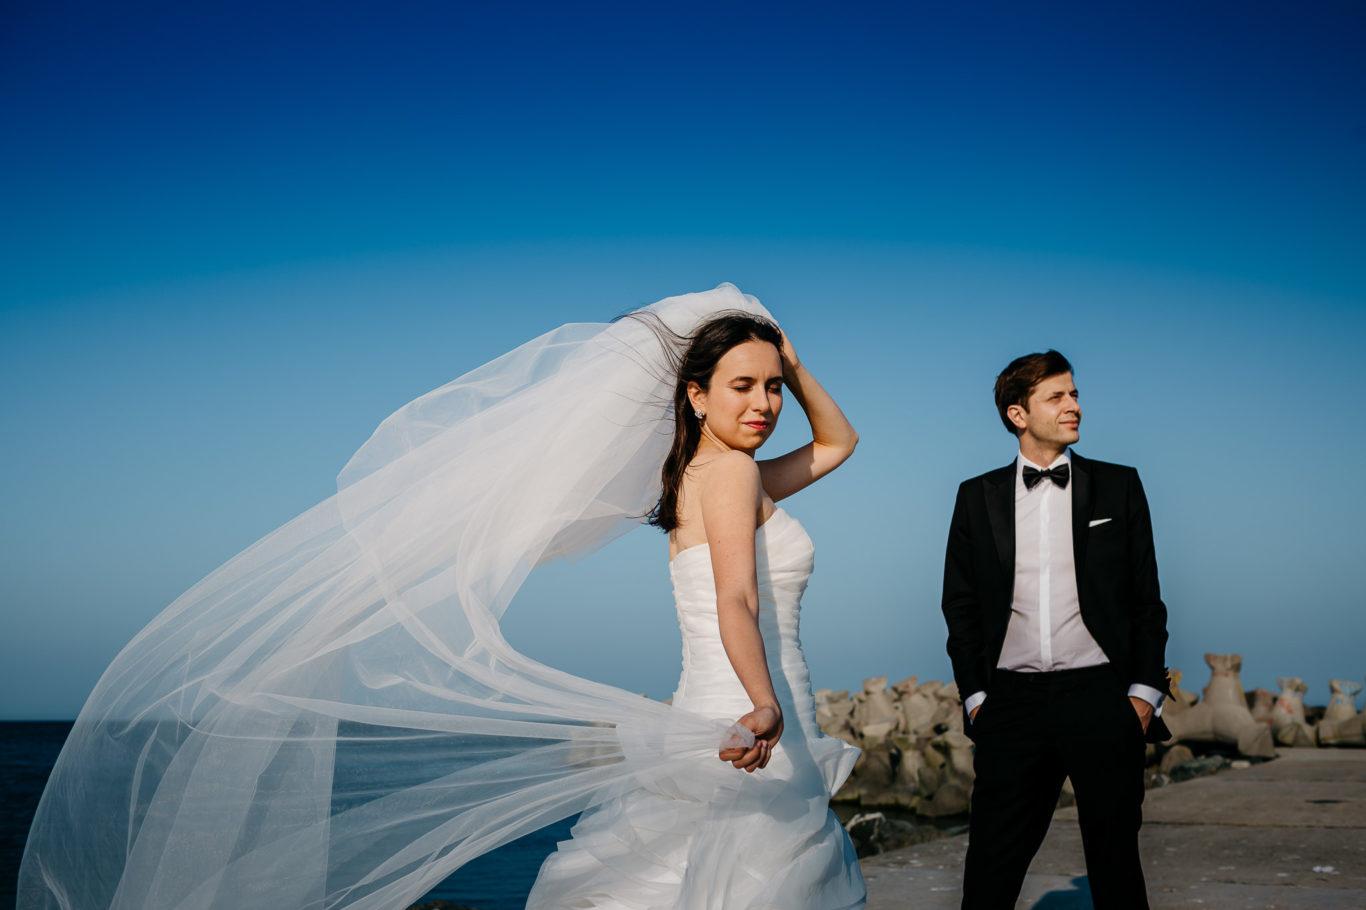 1138-Sesiune-foto-TTD-Simona-Valentin-fotograf-Ciprian-Dumitrescu-CDF_0906